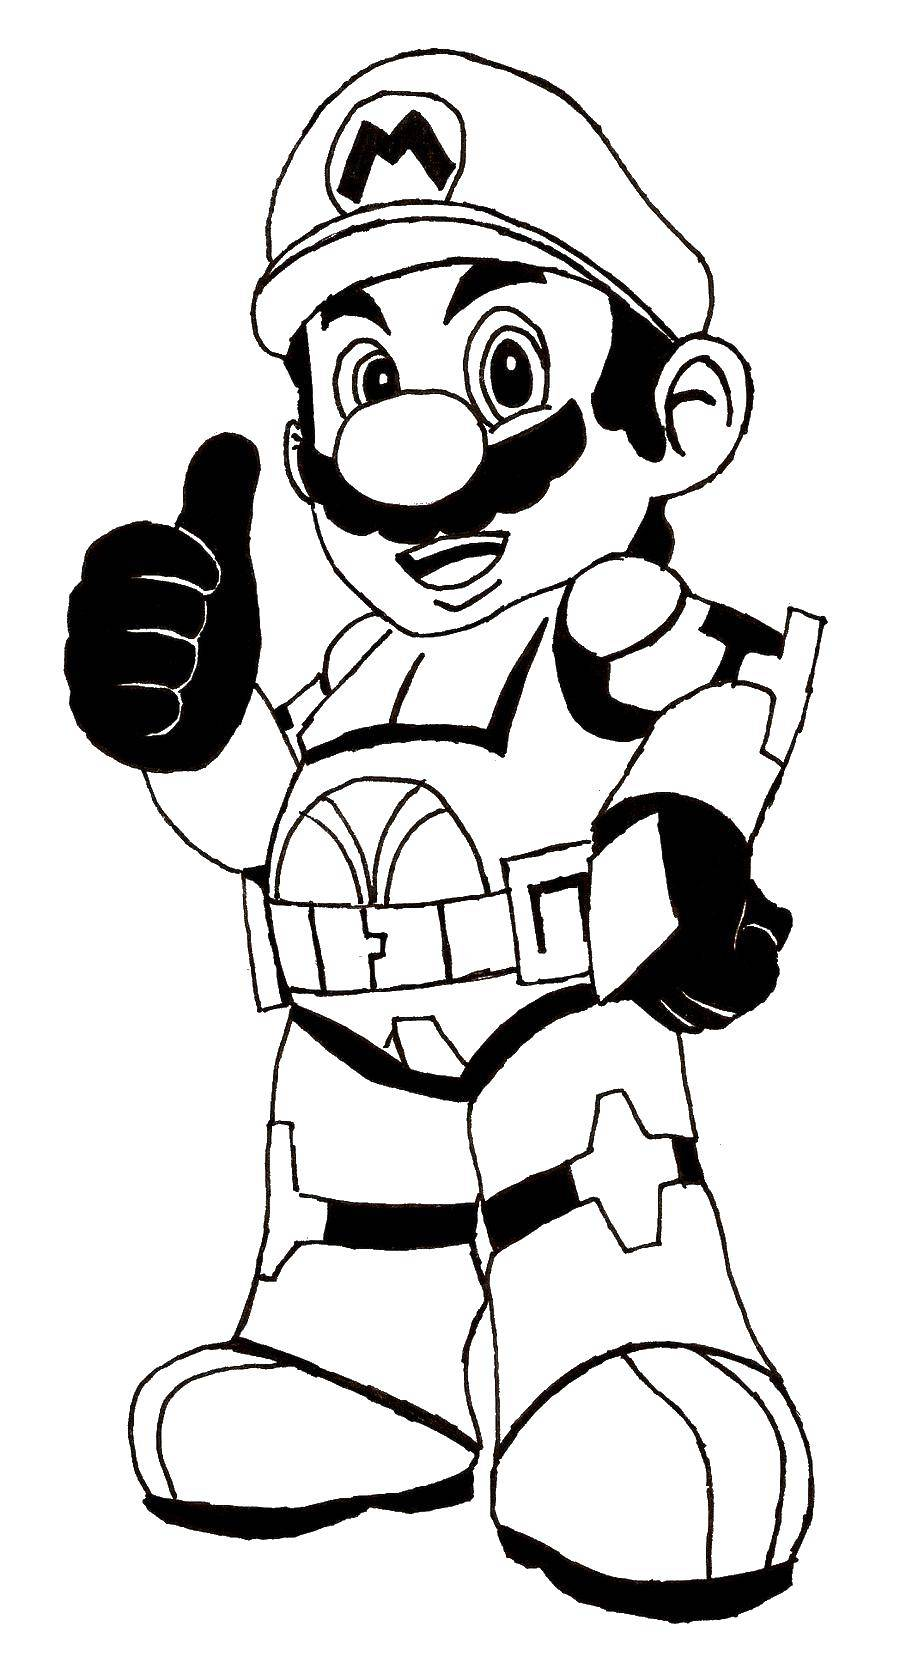 Название: Раскраска Марио. Категория: марио. Теги: марио, игры, персонажи, супер марио.